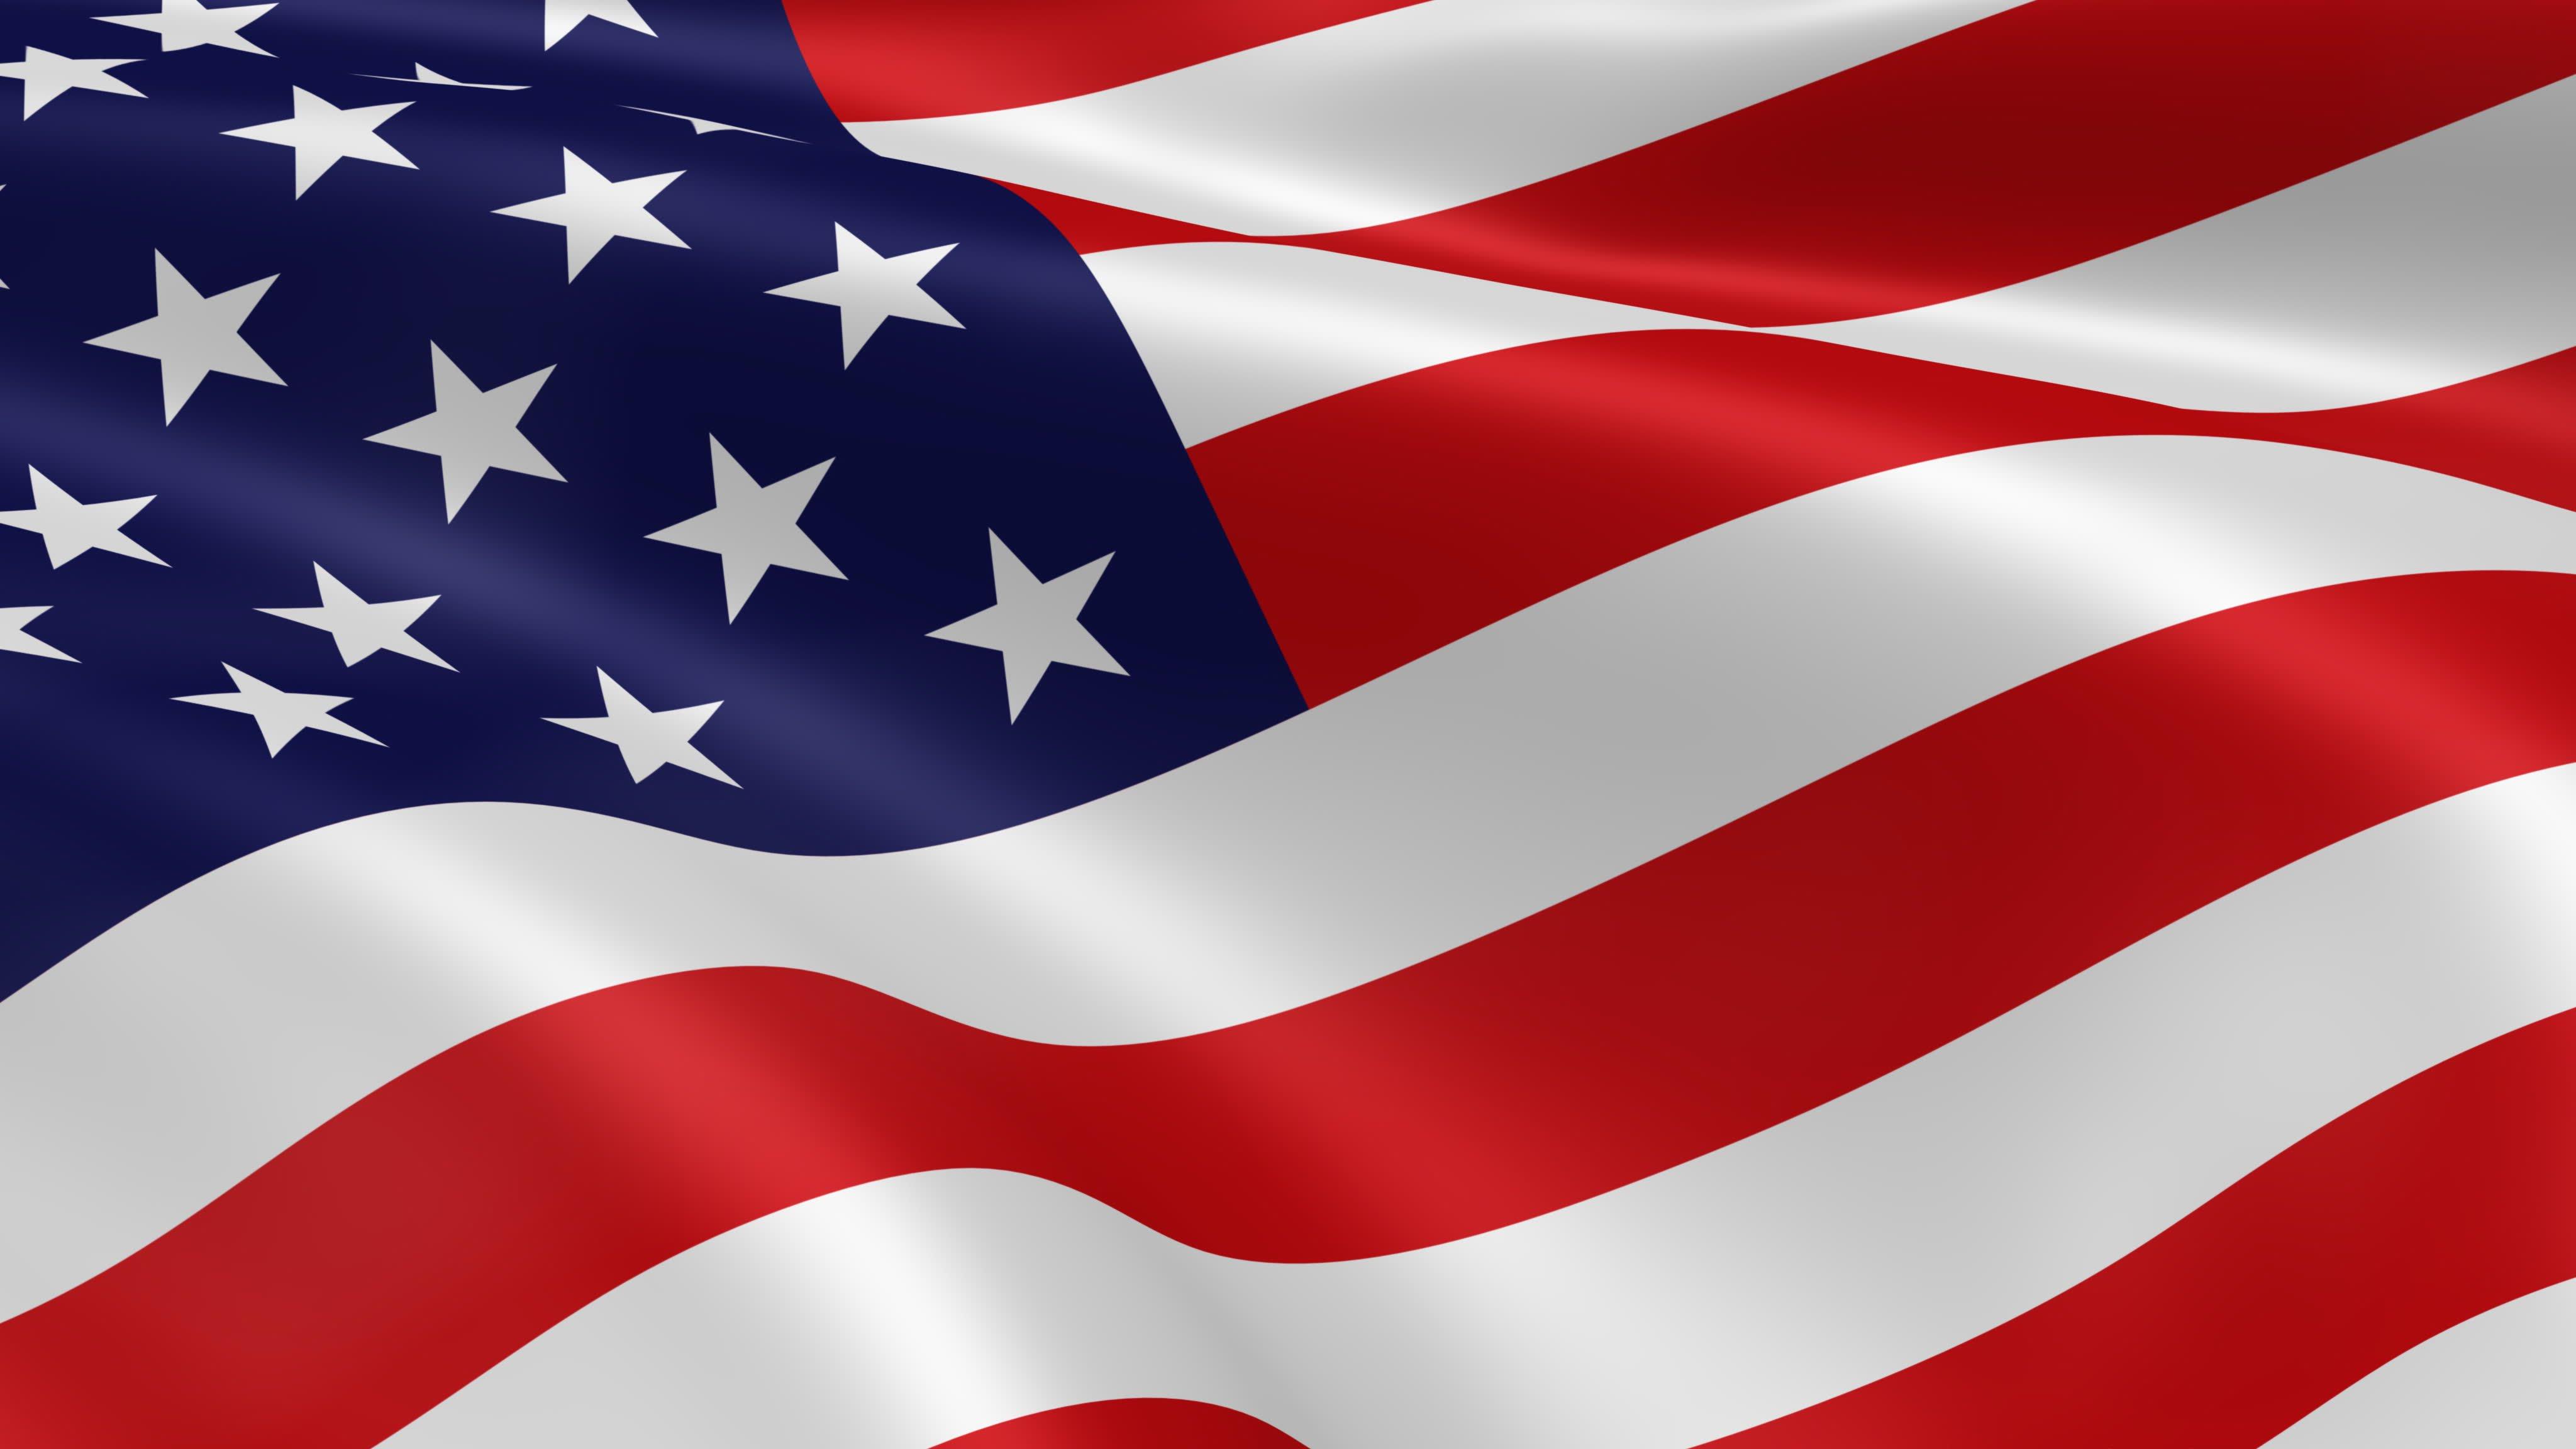 americanflag (1)